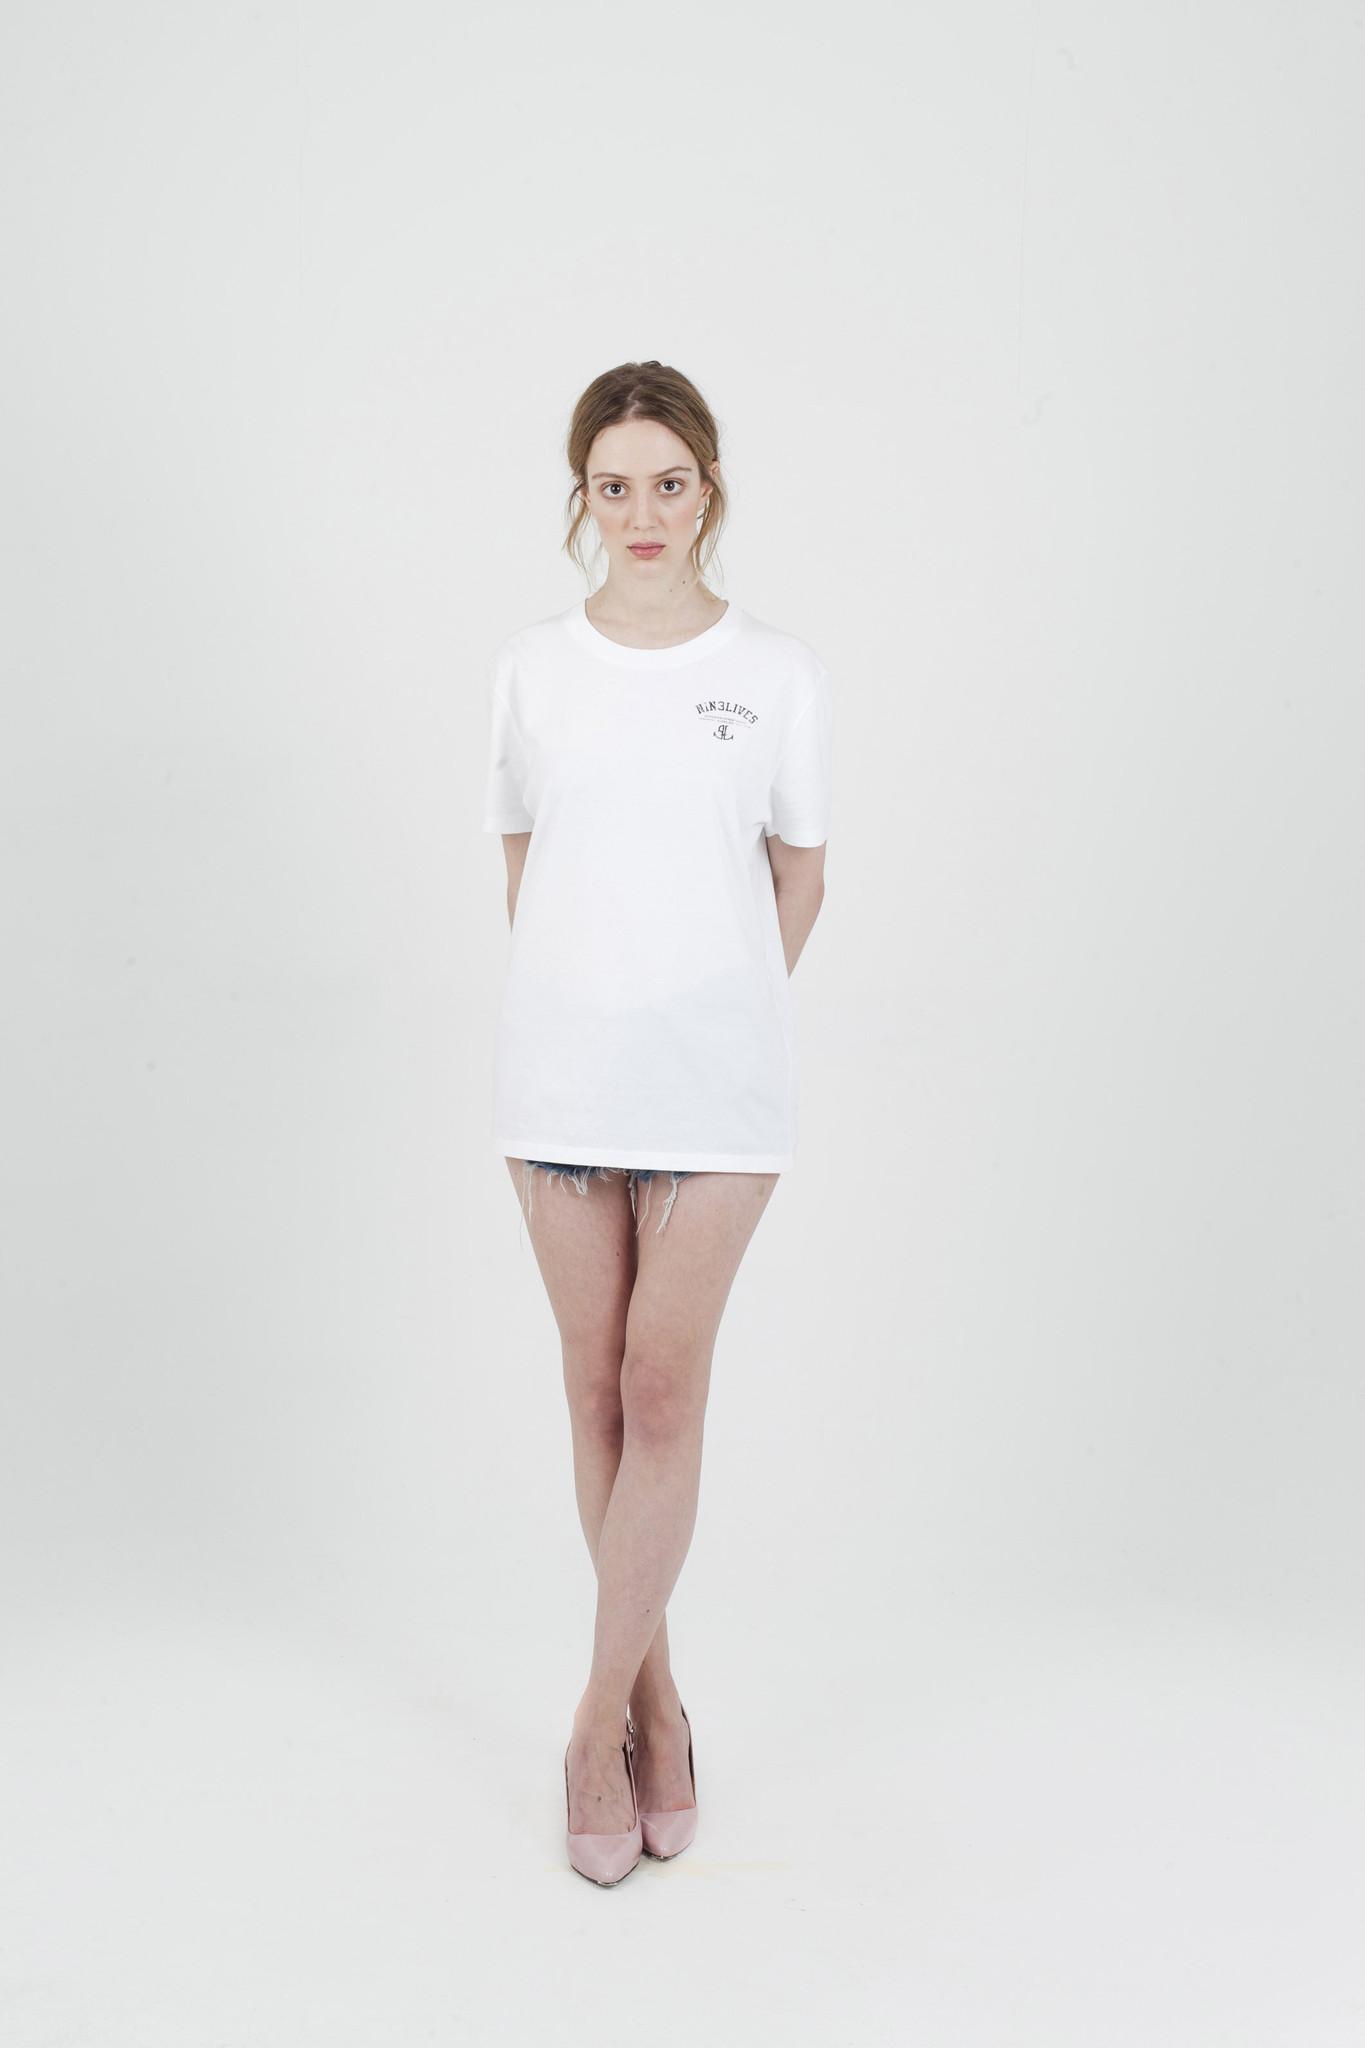 Nine Lives 'Low Profile' T-shirt